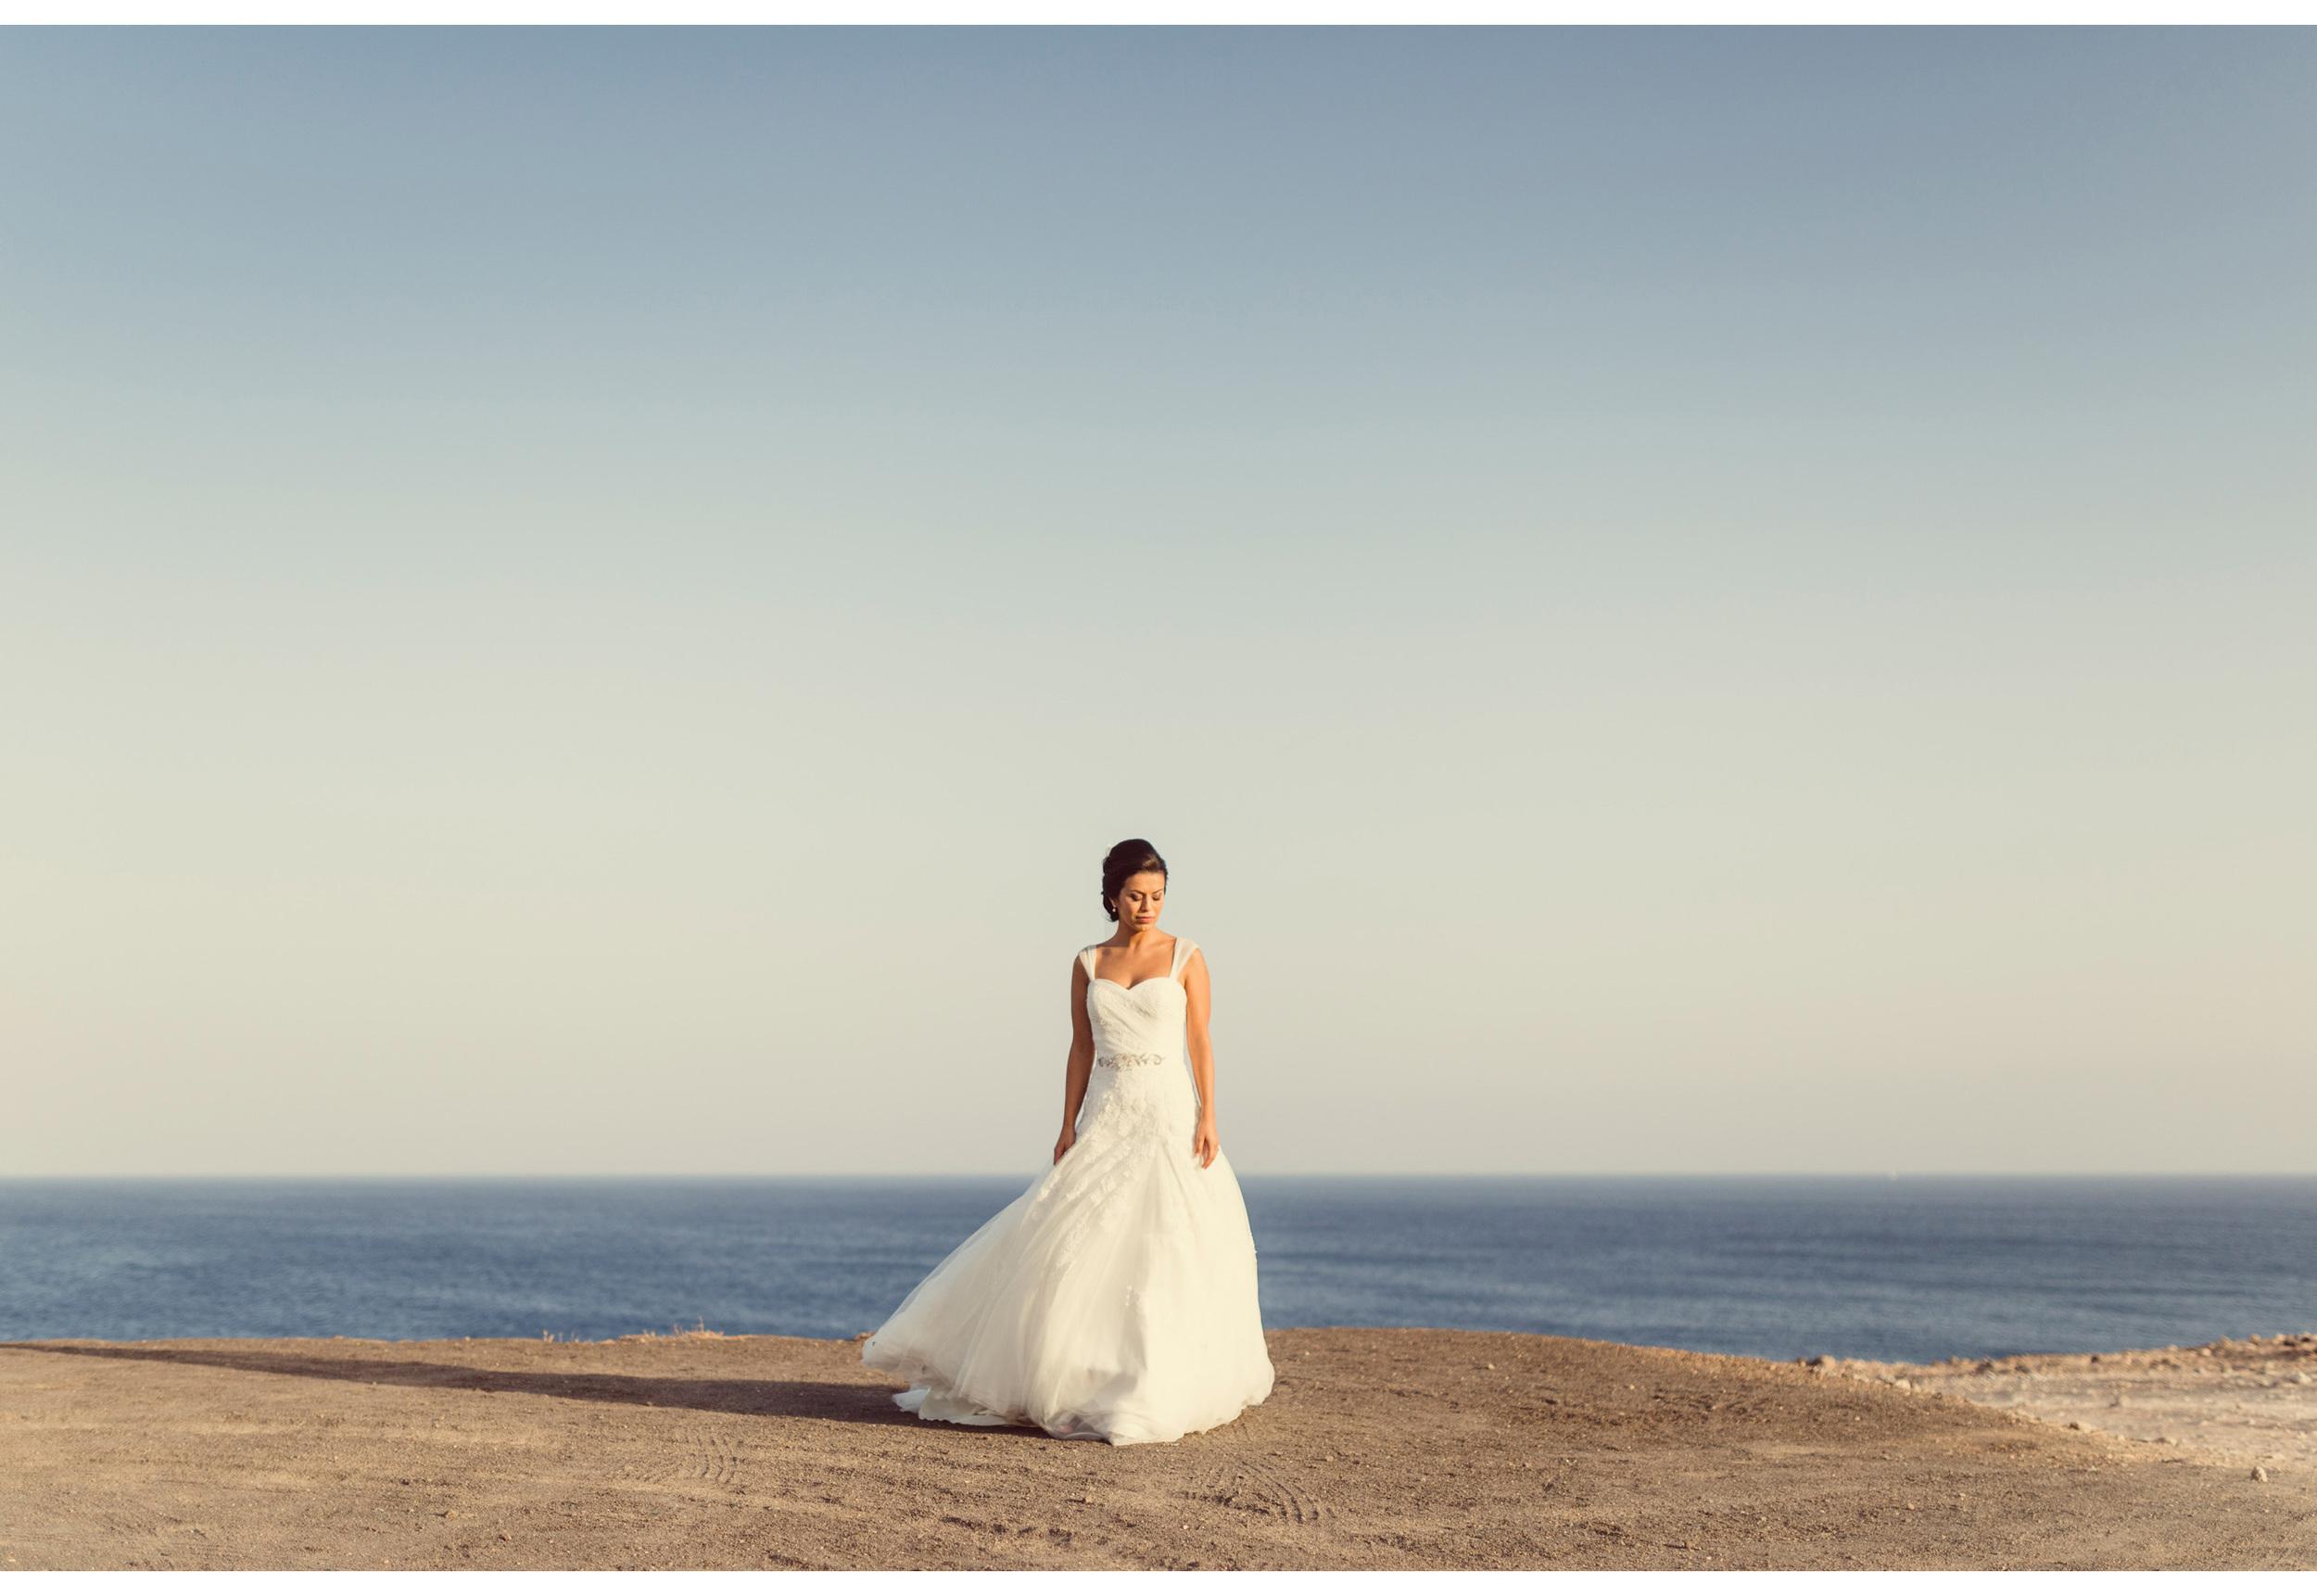 boda lanzarote 017.jpg